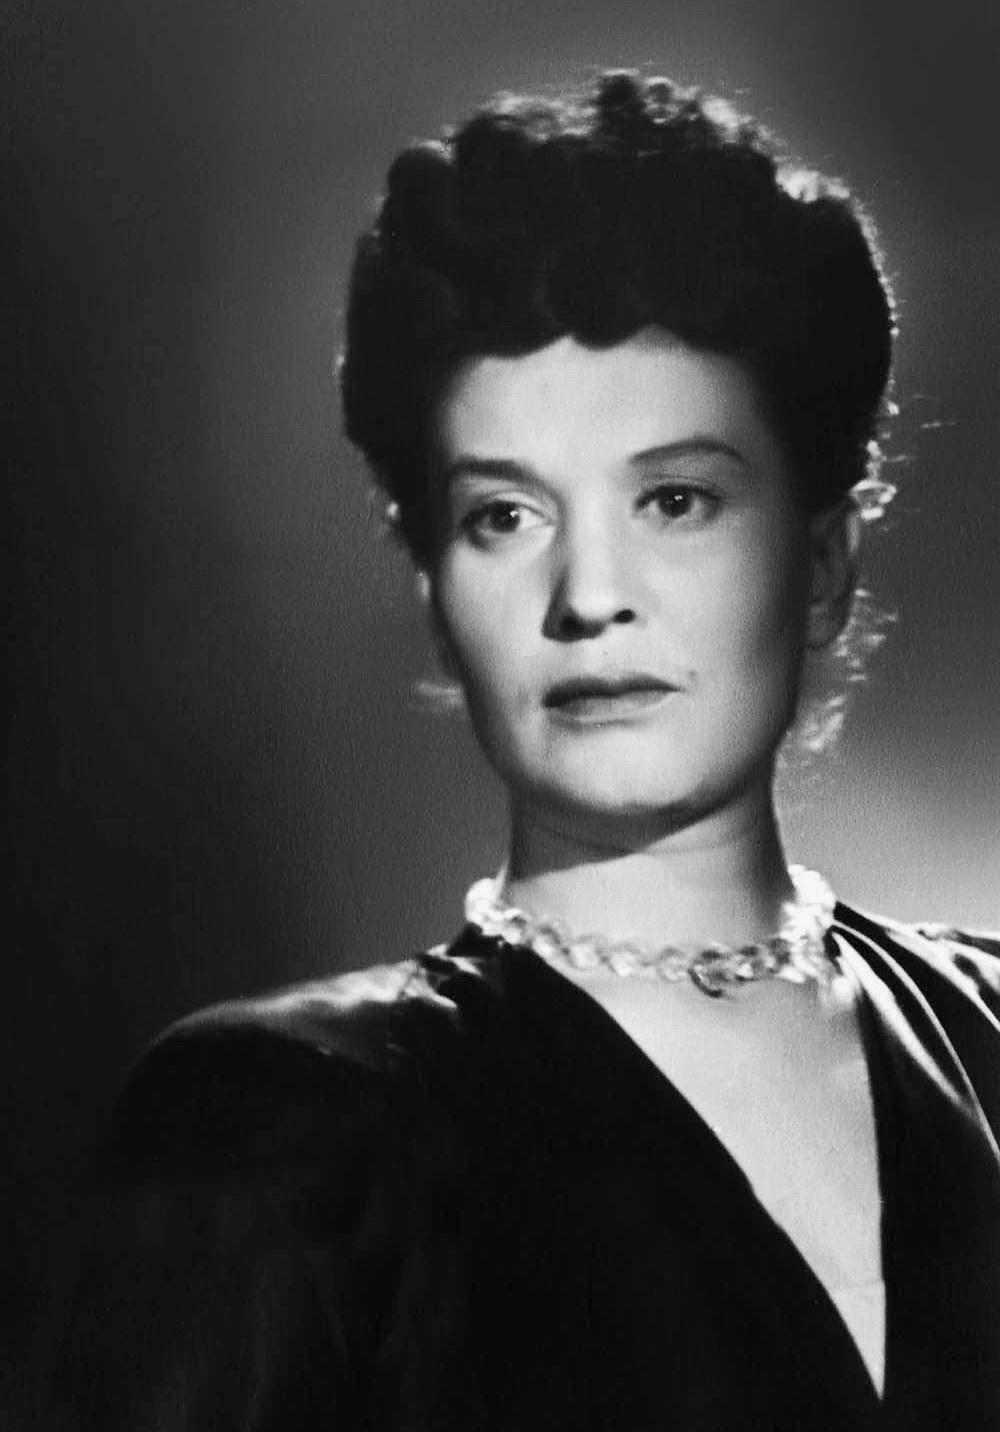 Нина Алисова, средина 1940-х  гг.